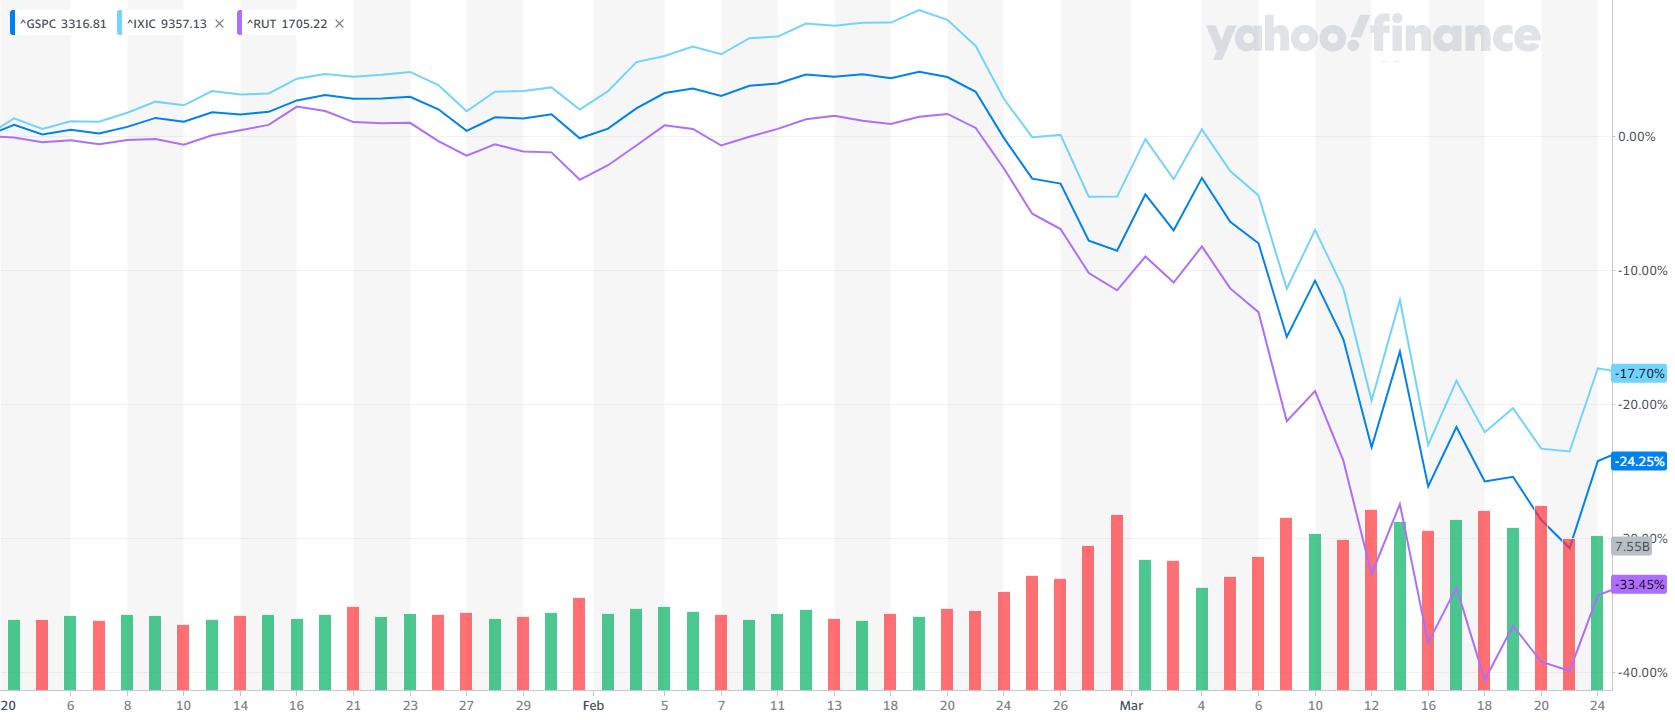 S&P 500 Nasdaq Russell 2000 crash to 3-23-2020